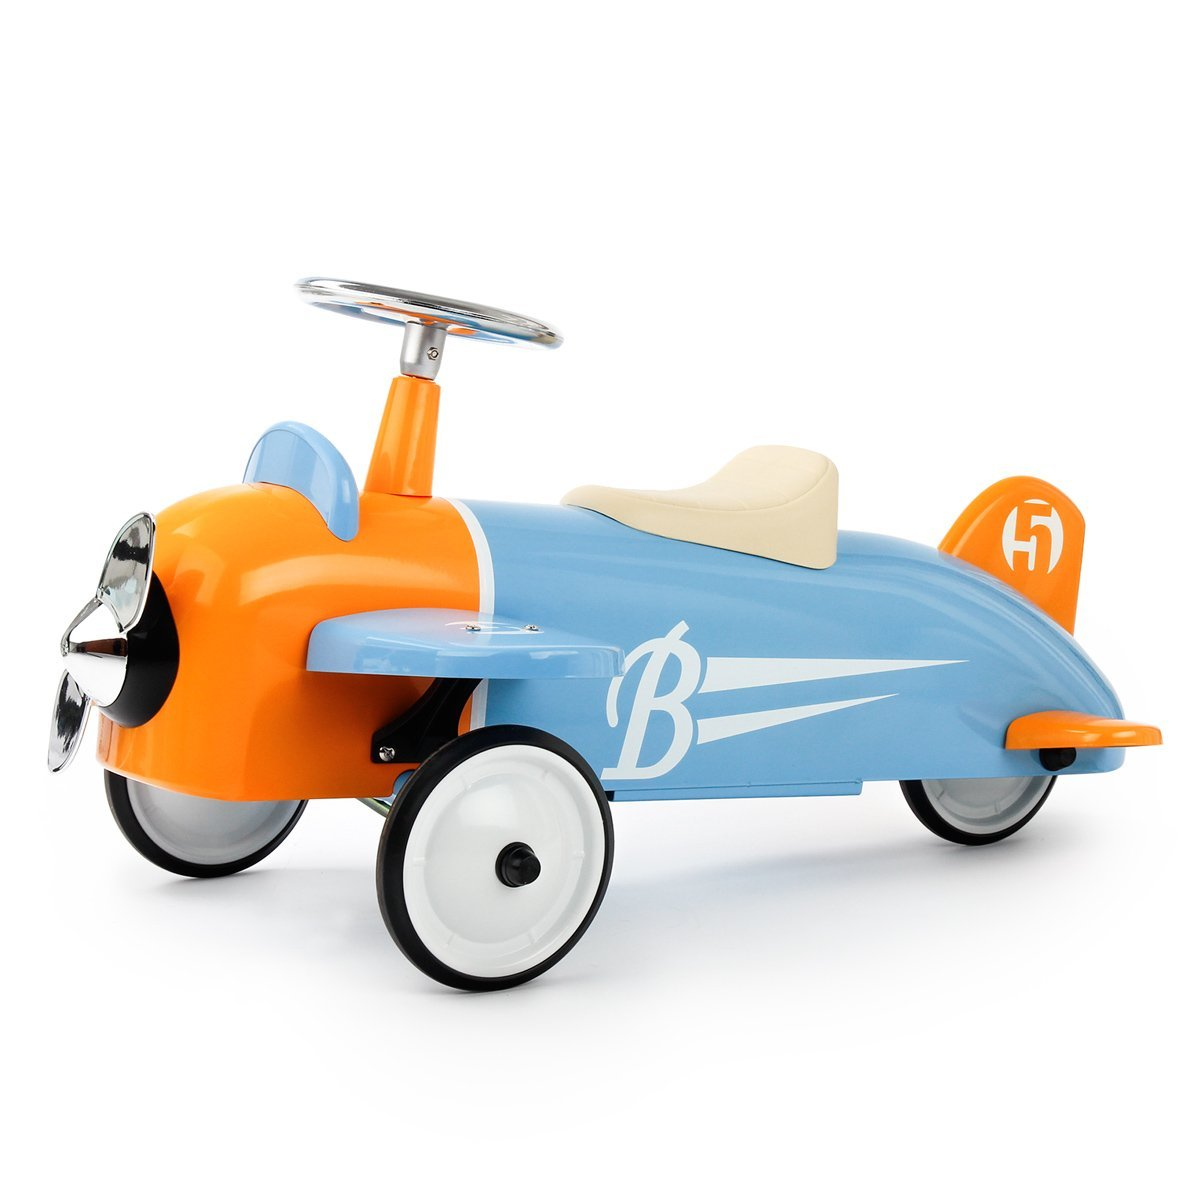 Baghera loopauto vliegtuig Sky blue Plane